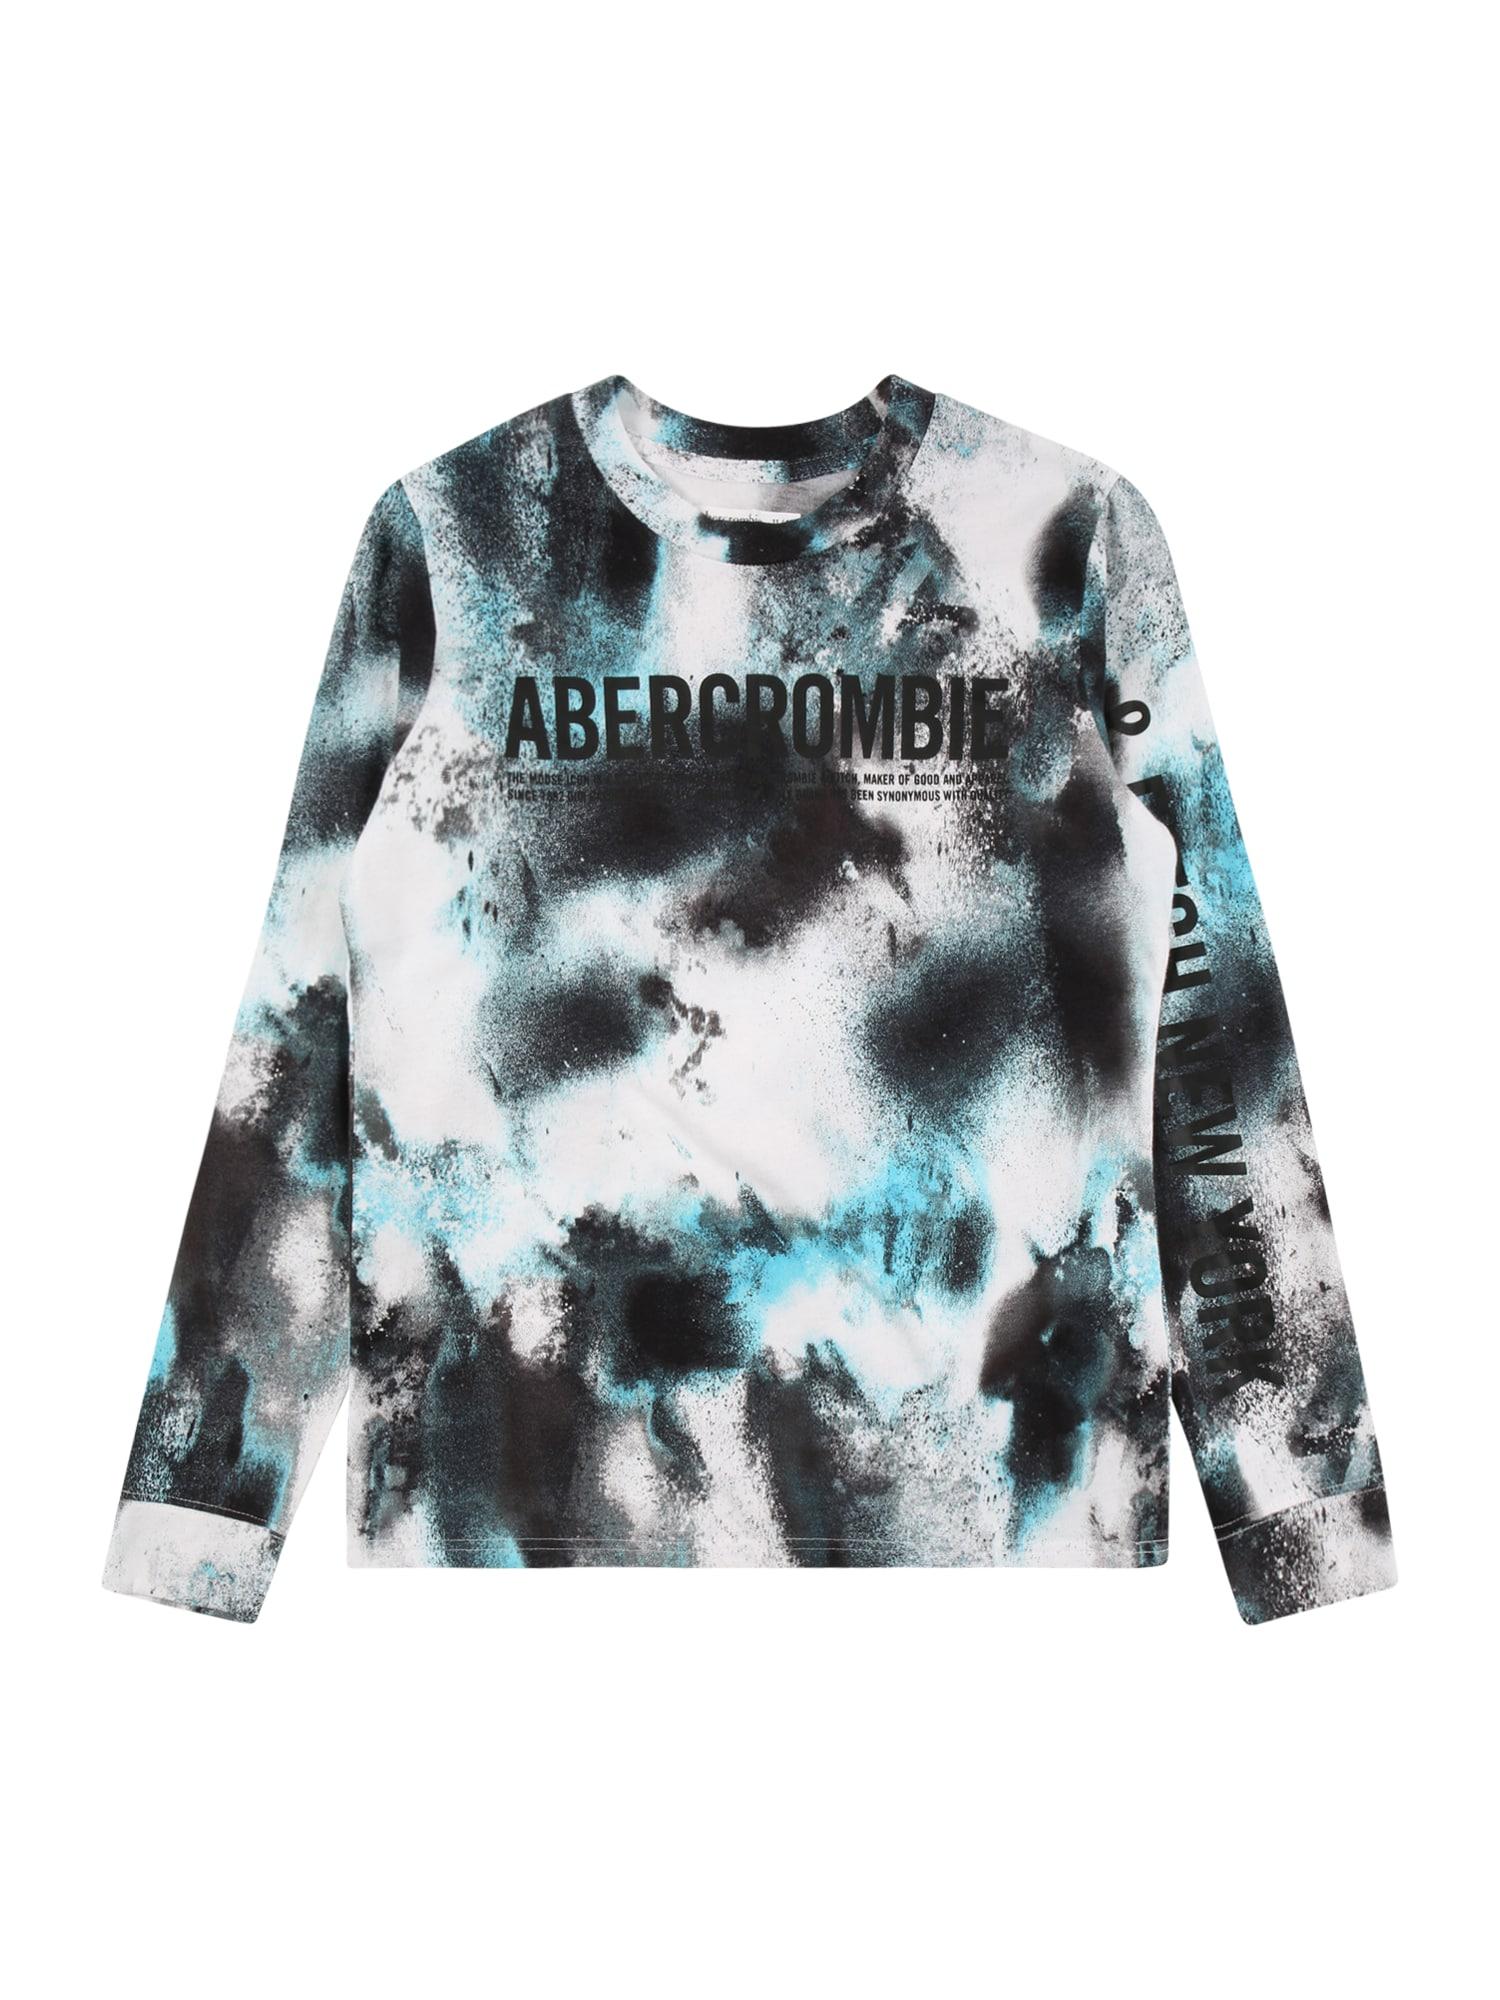 Abercrombie & Fitch Marškinėliai 'HIKE BEAST' nakties mėlyna / vandens spalva / balta / juoda